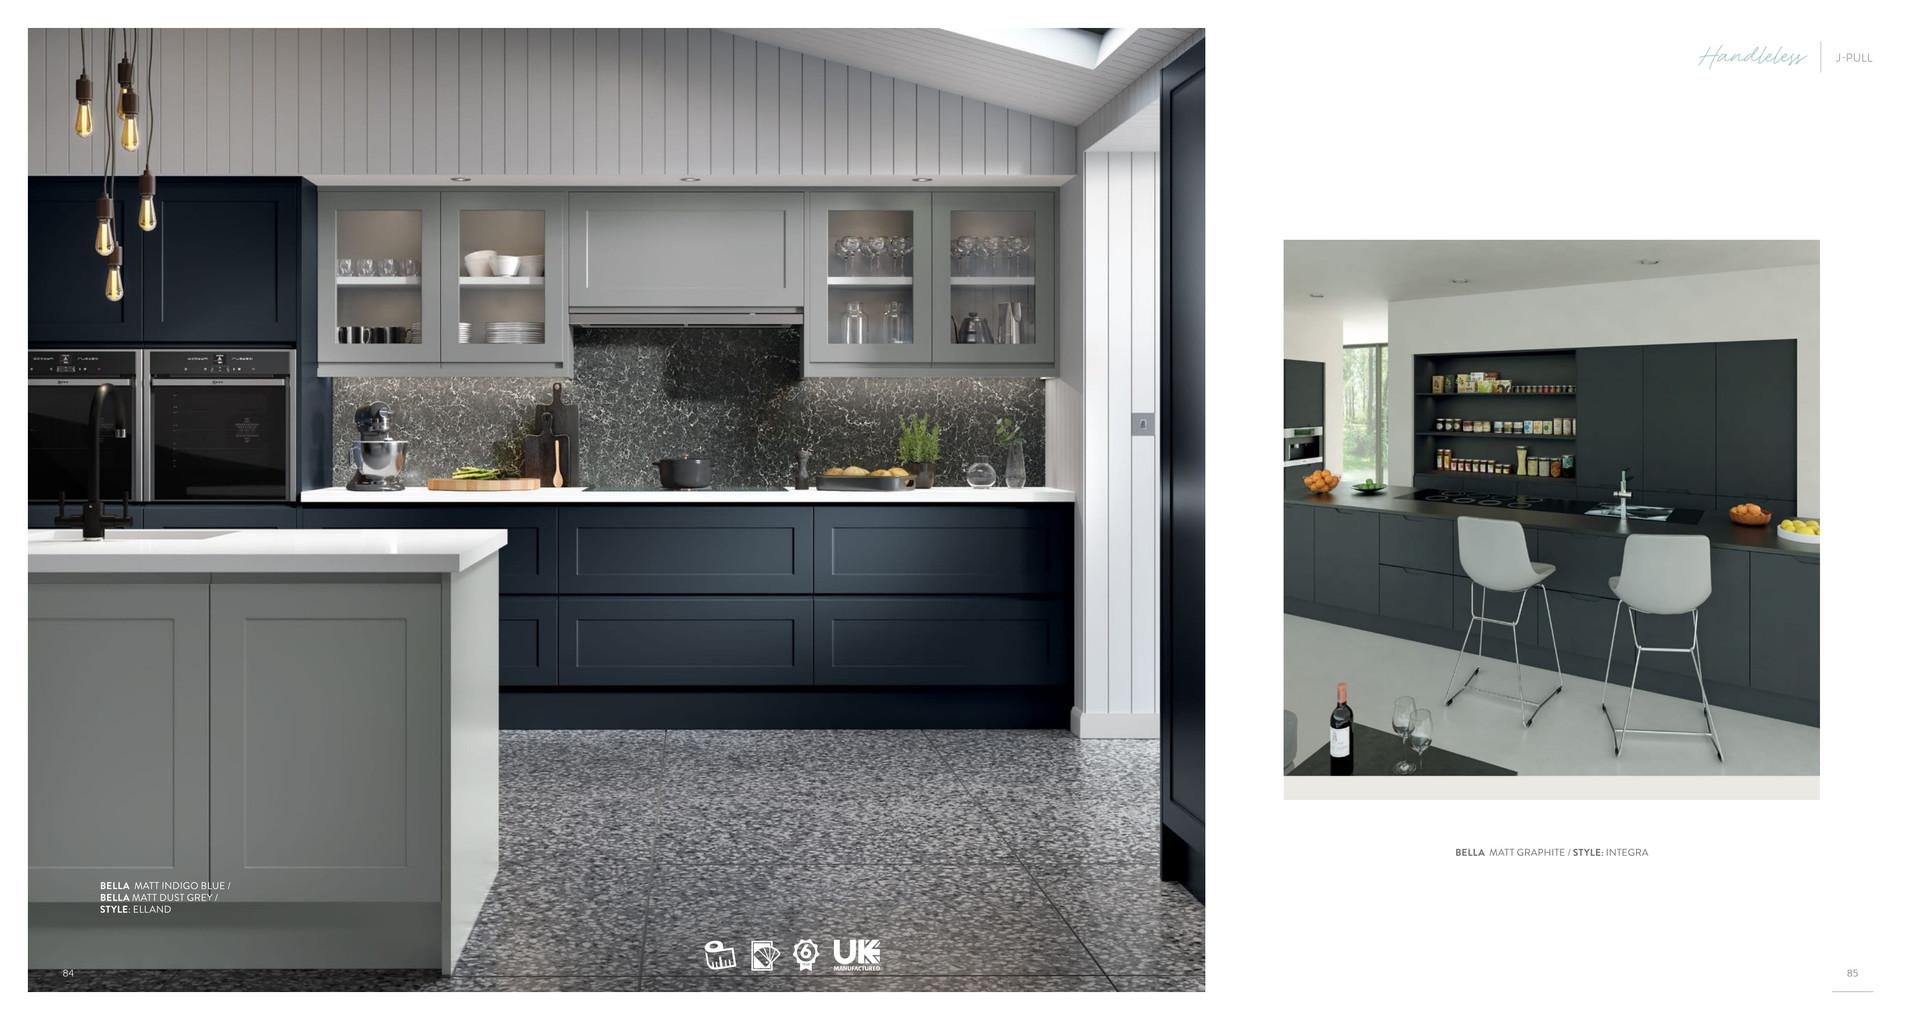 blossom-avenue-kitchen-brochure-2020-43.